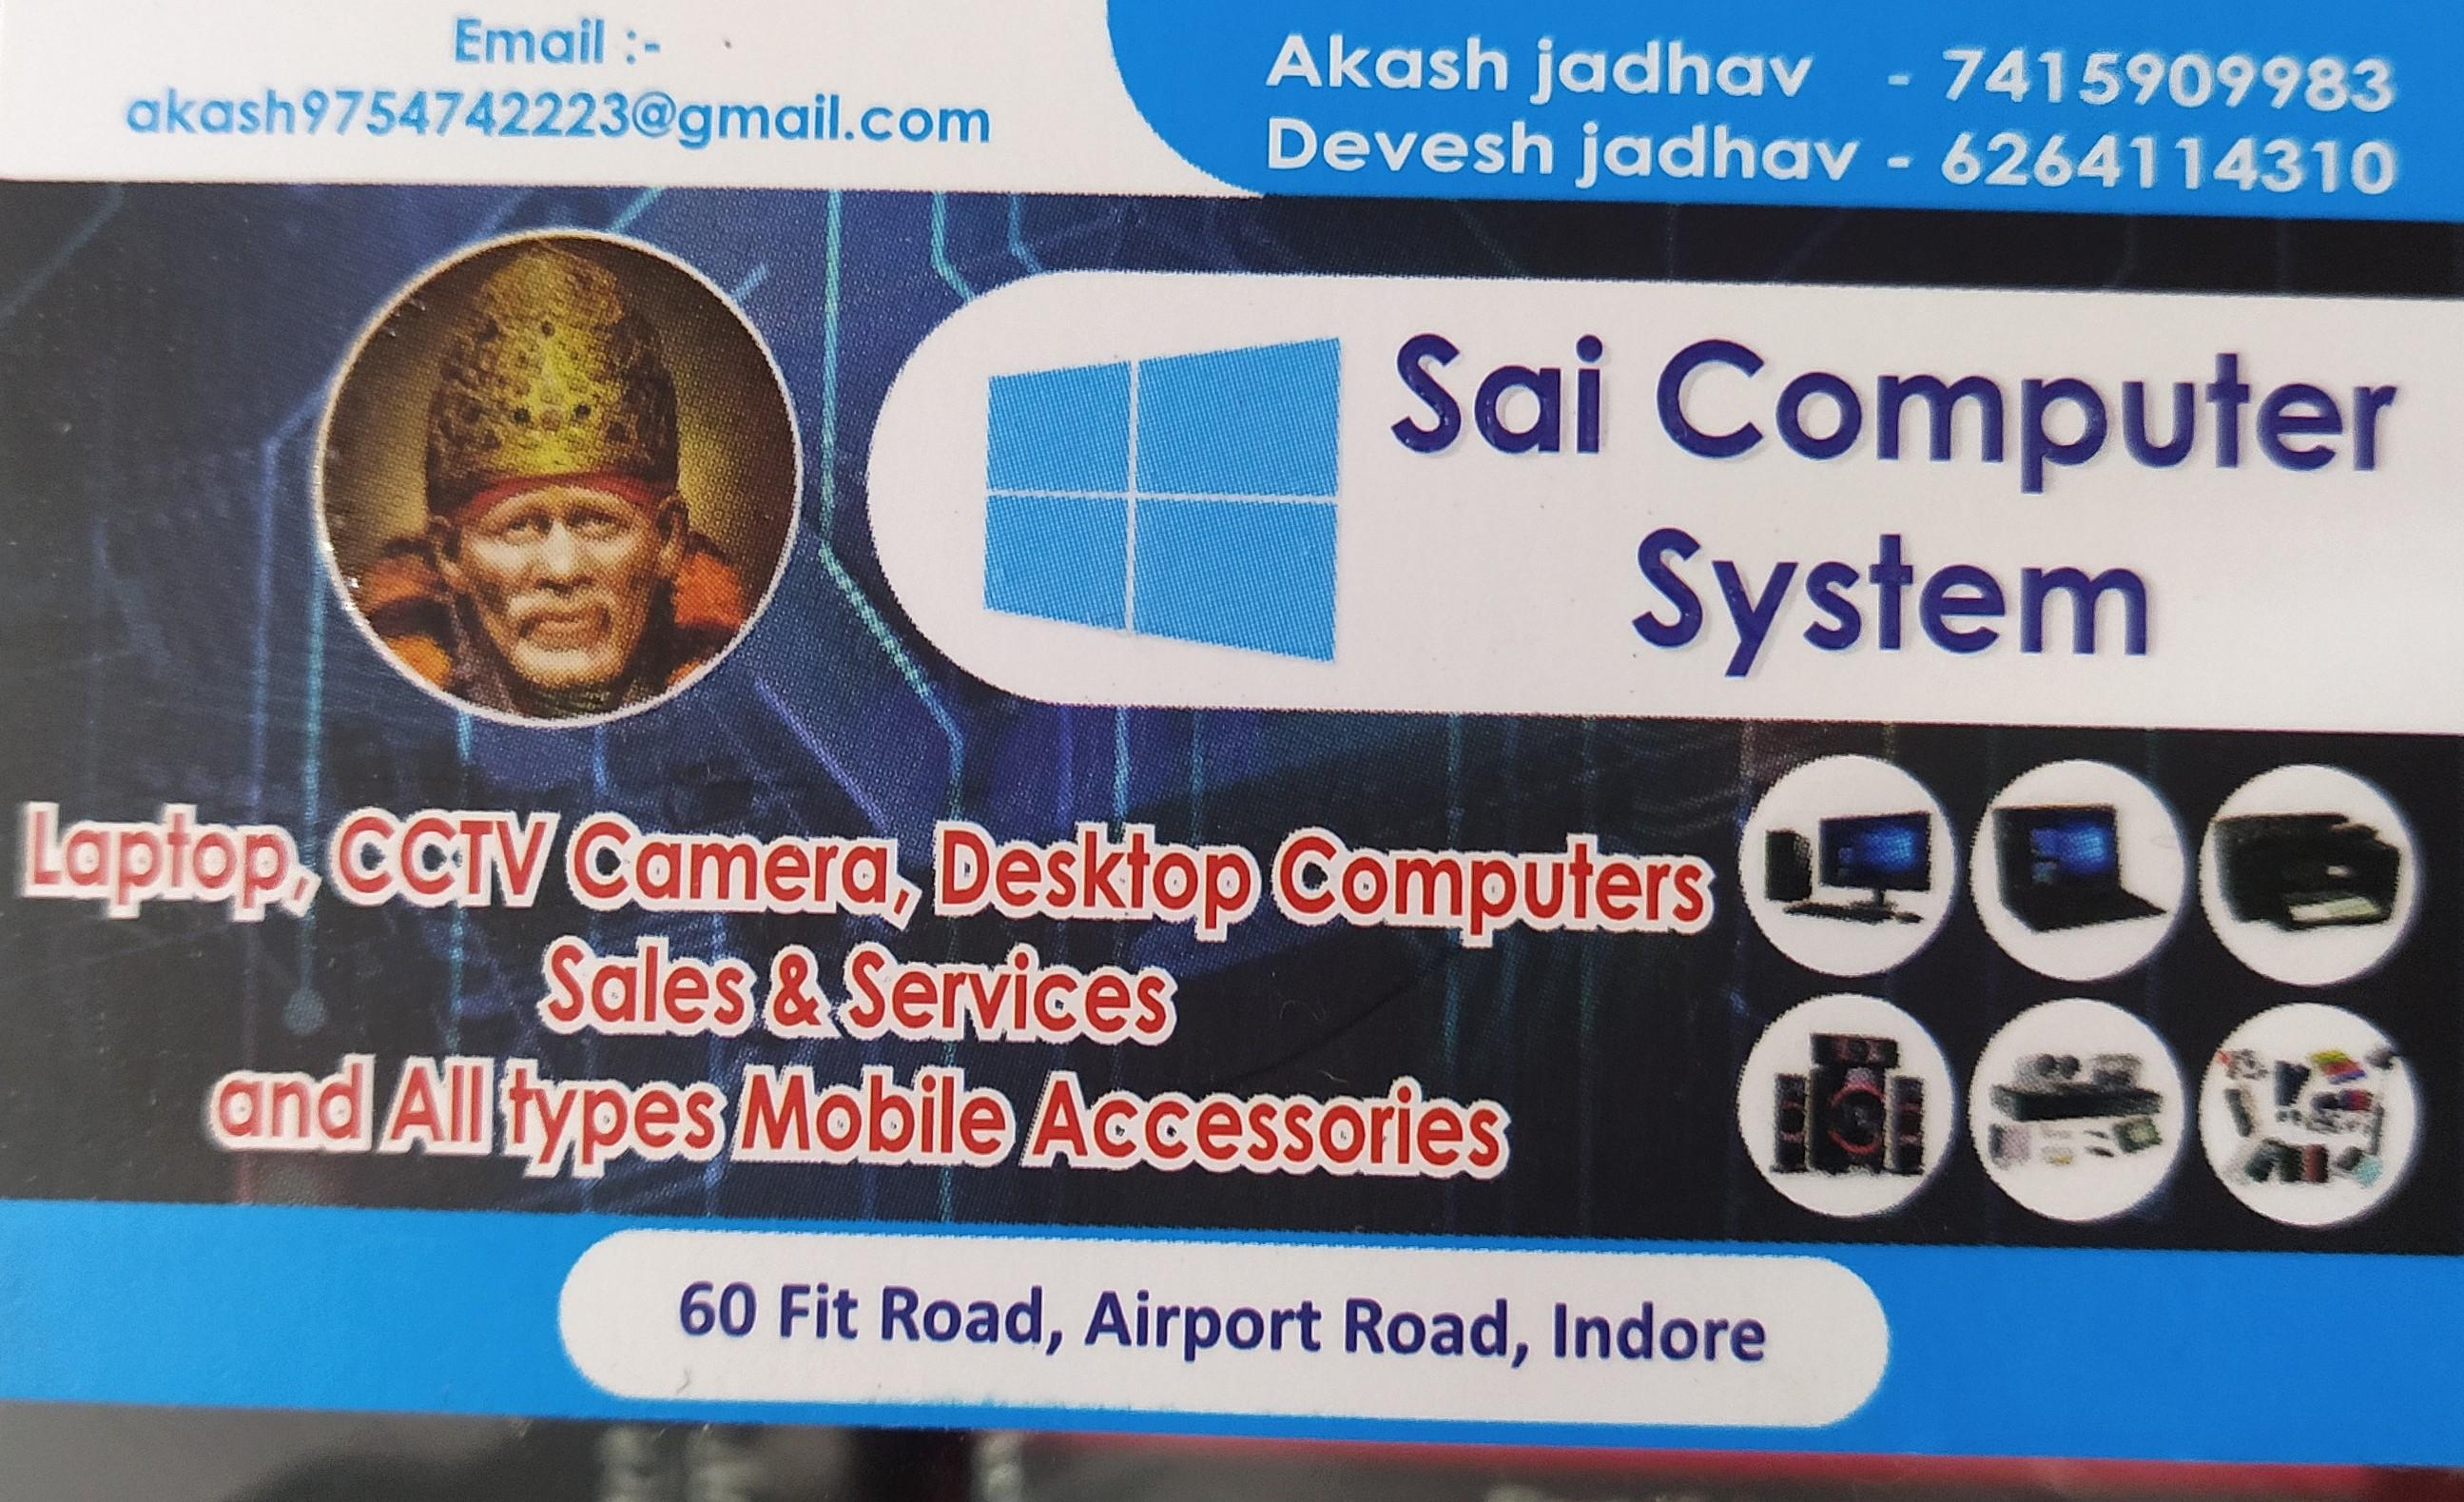 Sai computer system